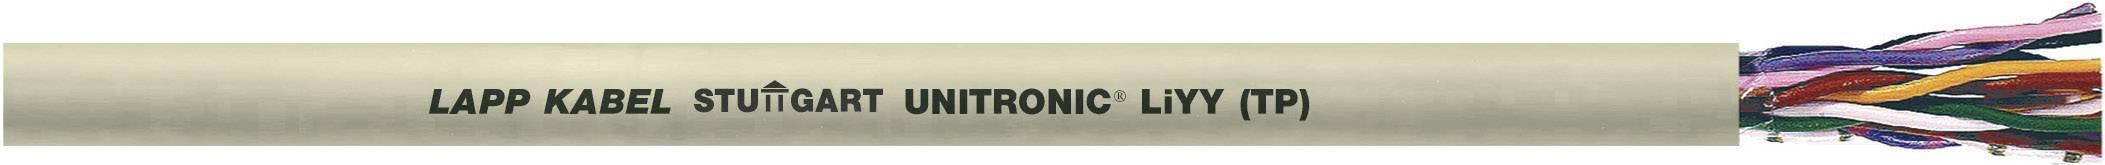 Datový kabel LappKabel UNITRONIC LIYY TP, 4 x 2 x 0,5 mm²